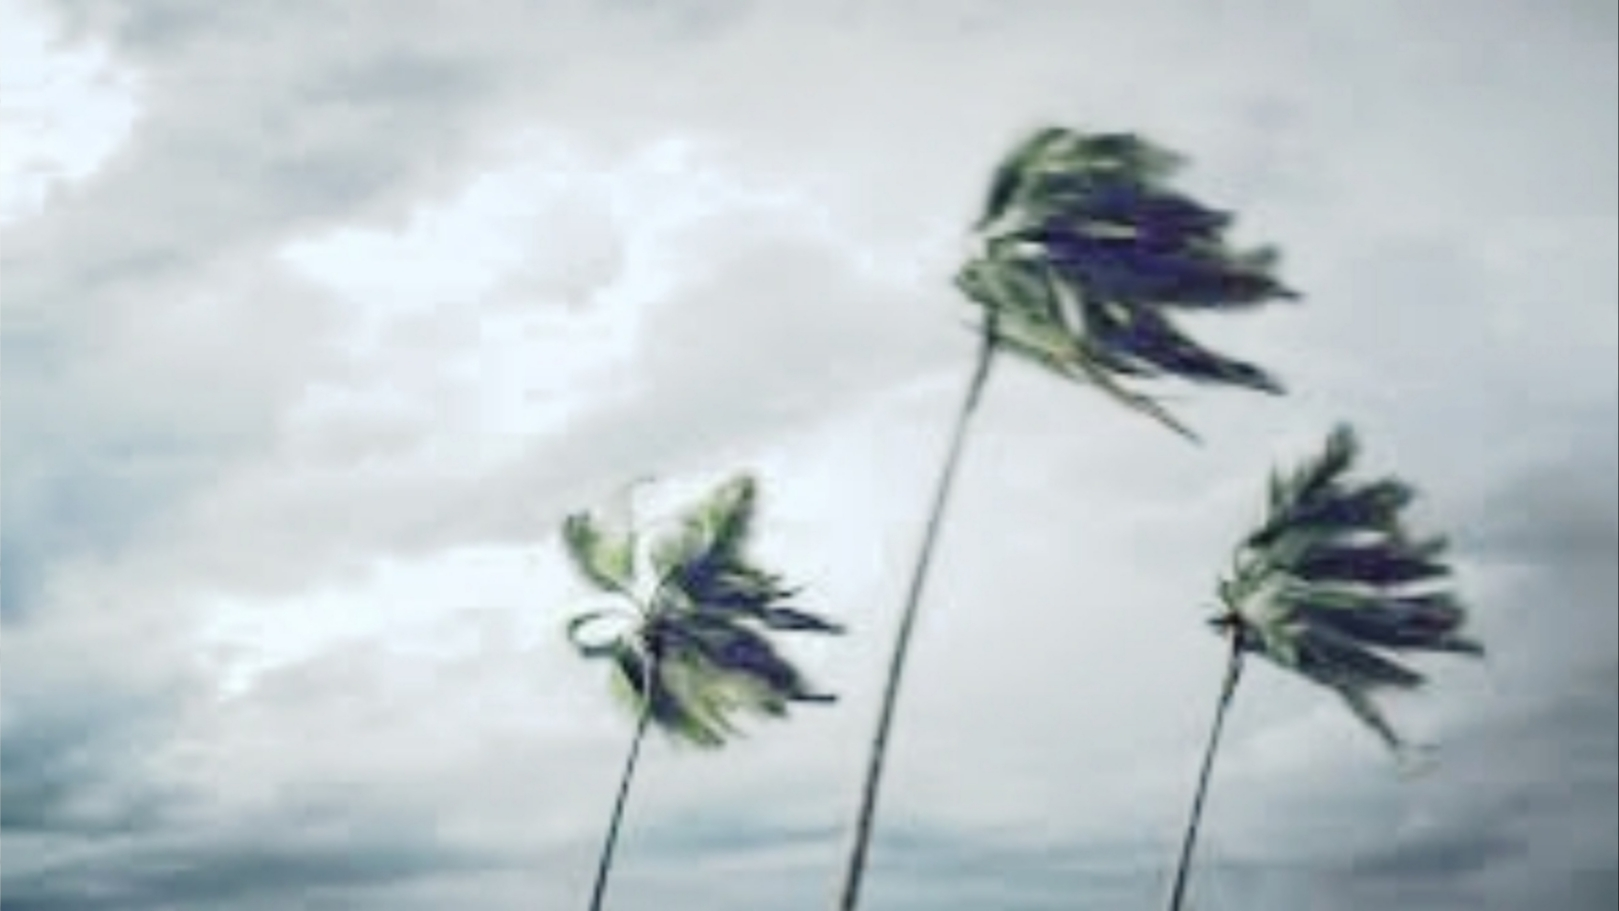 Ilustrasi angin kencang. Foto: Istimewa